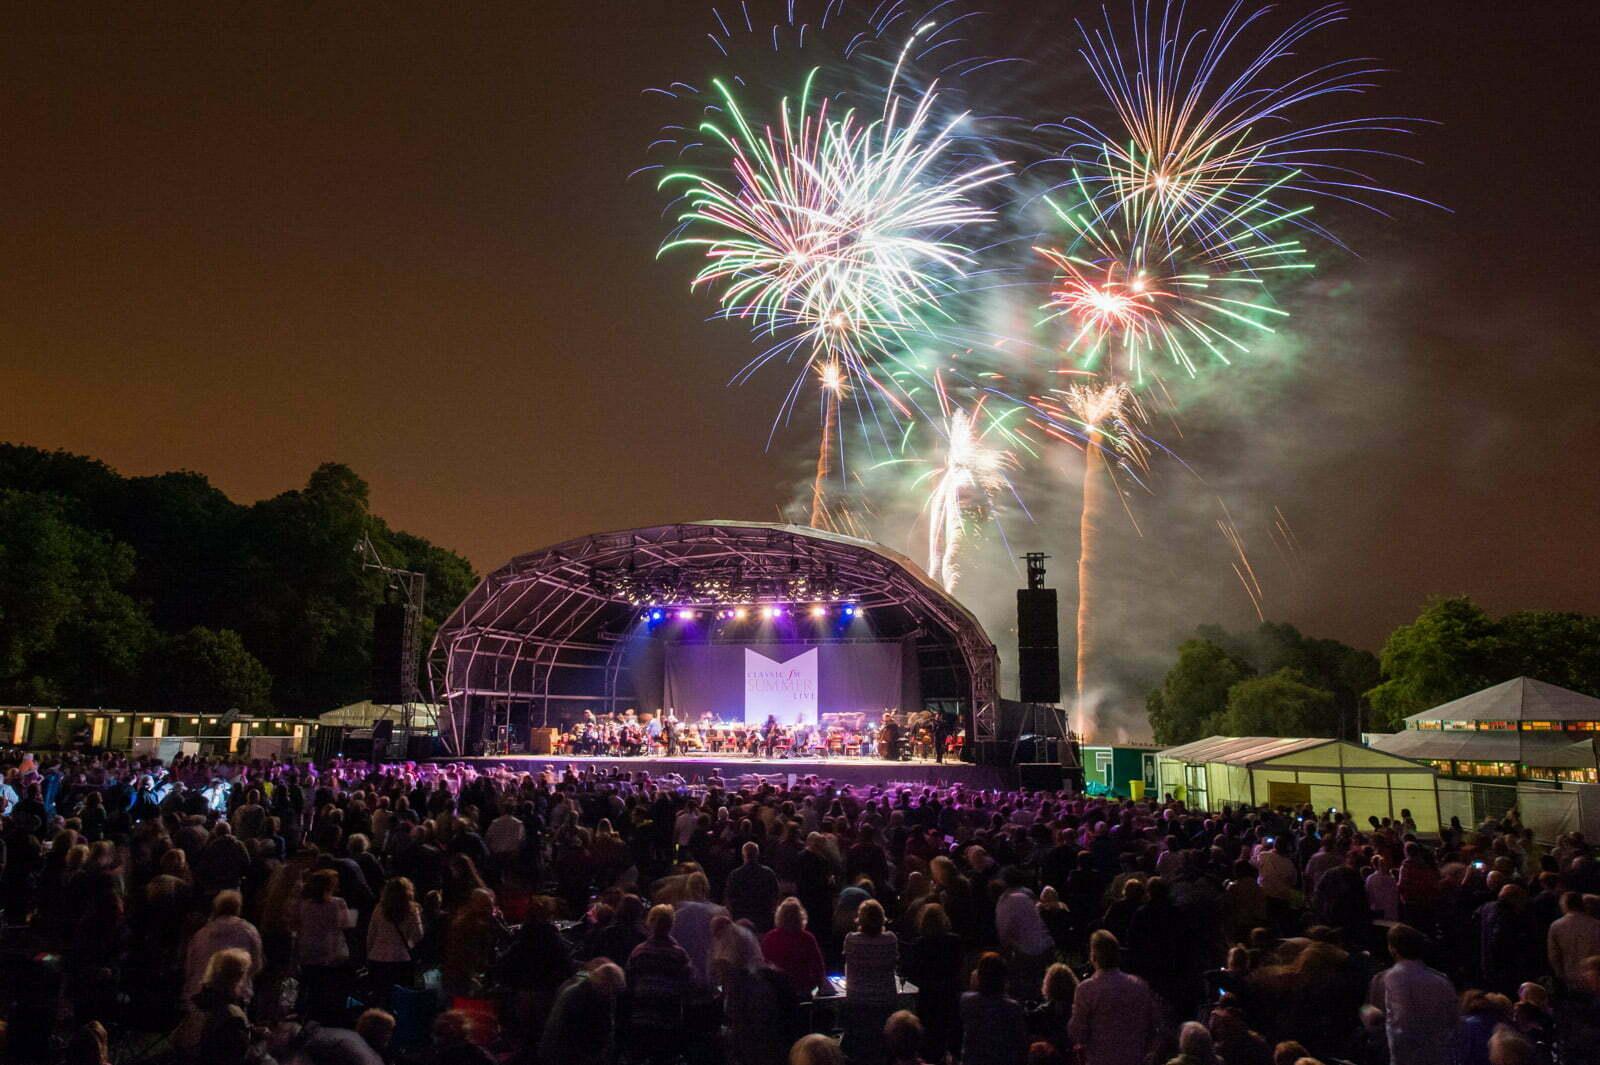 rlpo-limf-fantastic-fireworks-4419